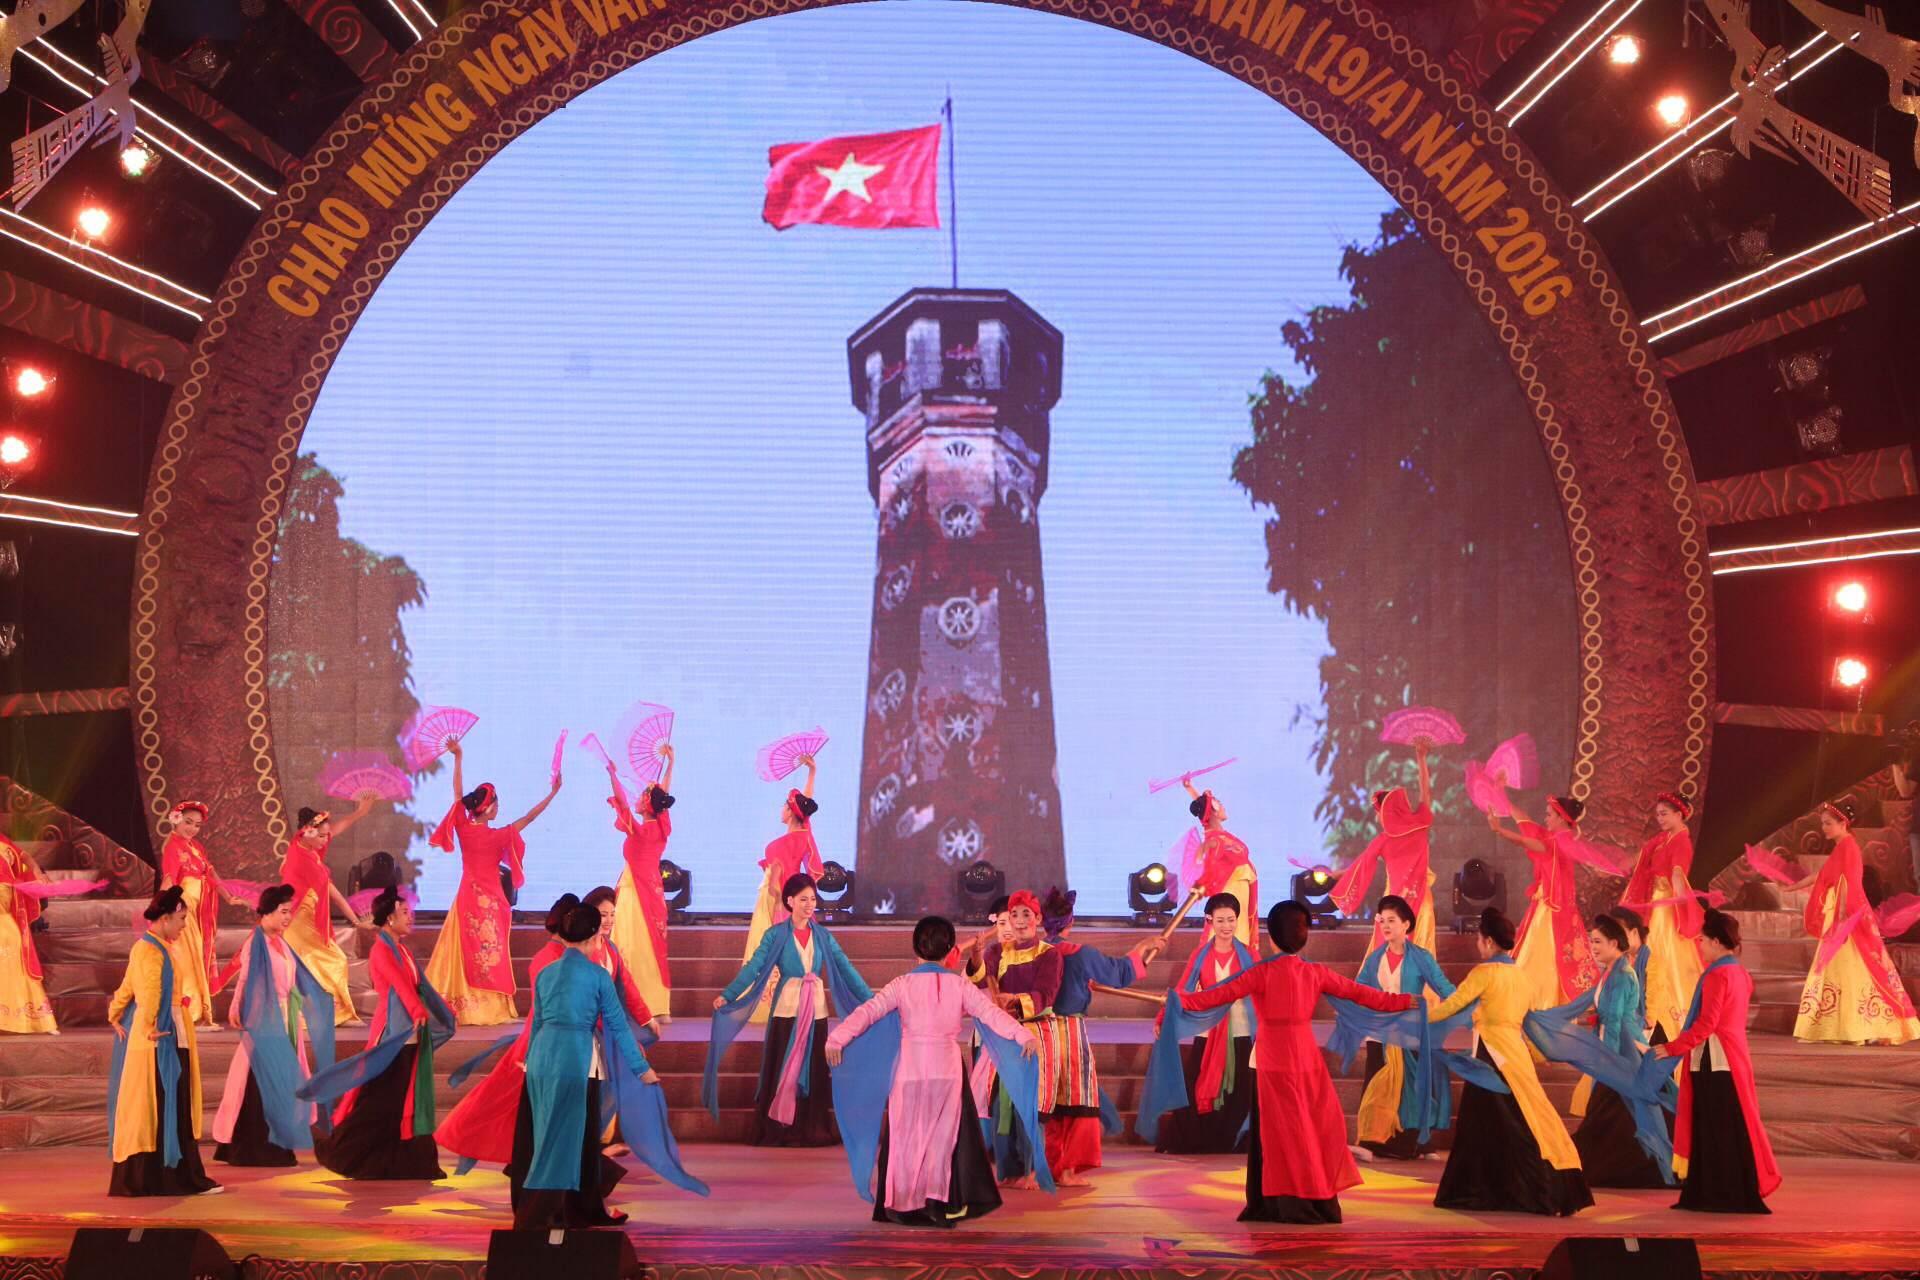 Pesta memuliakan nilai kebudayaan tradisional warga etnis- etnis